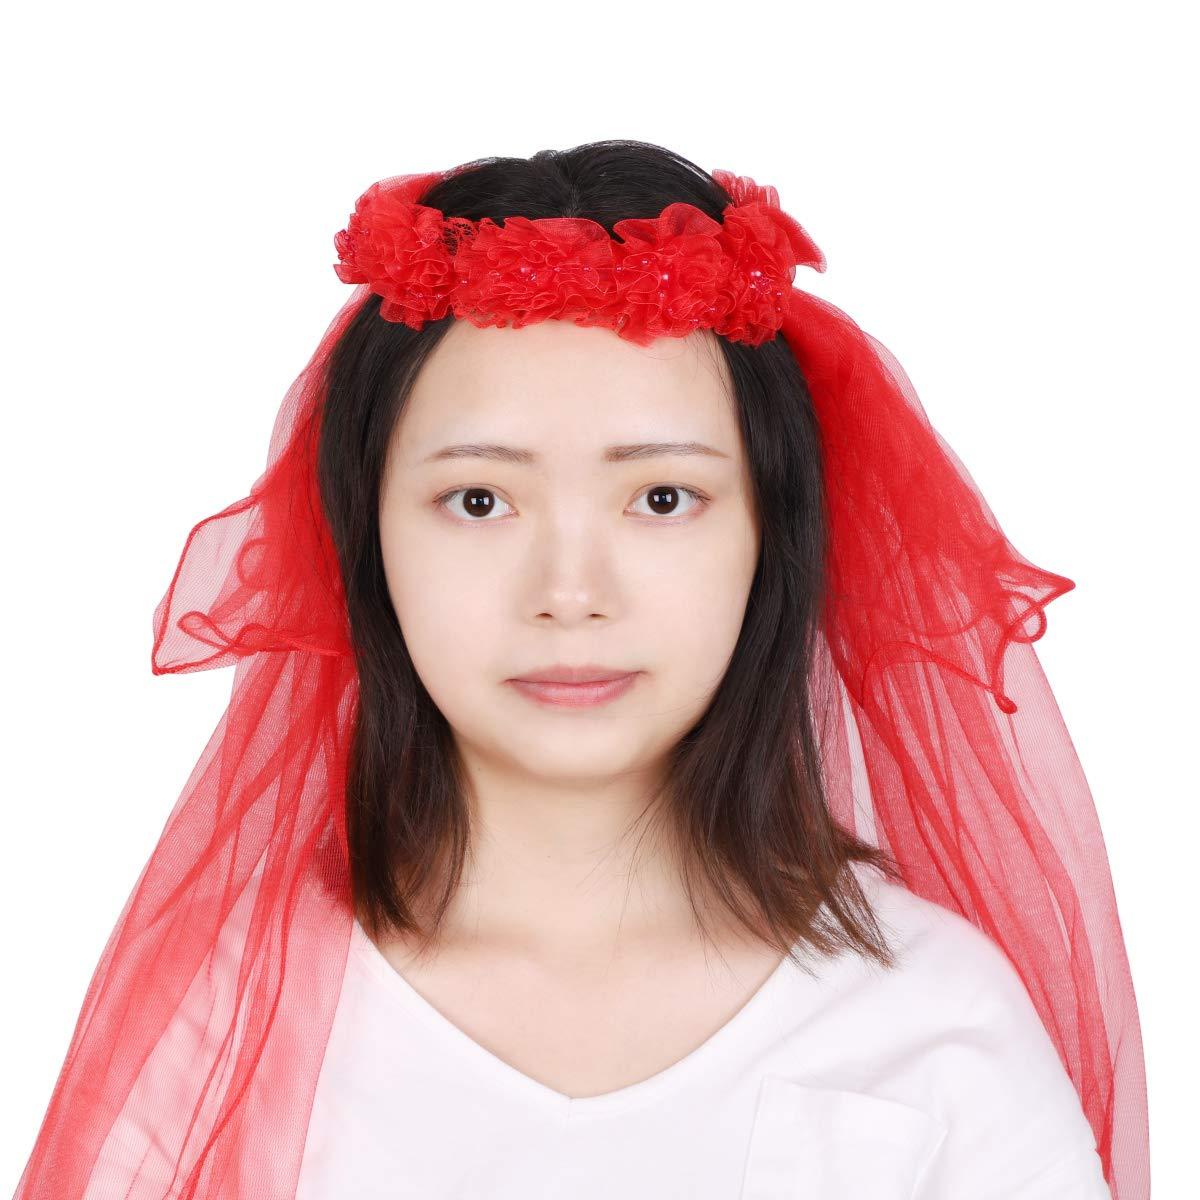 Flower Girls Veils First Communion Veils with Floral Wreath 2 Layers Flower Pearl Lace Veils Hair Accessory Wedding Flower Headband Hair Wreath